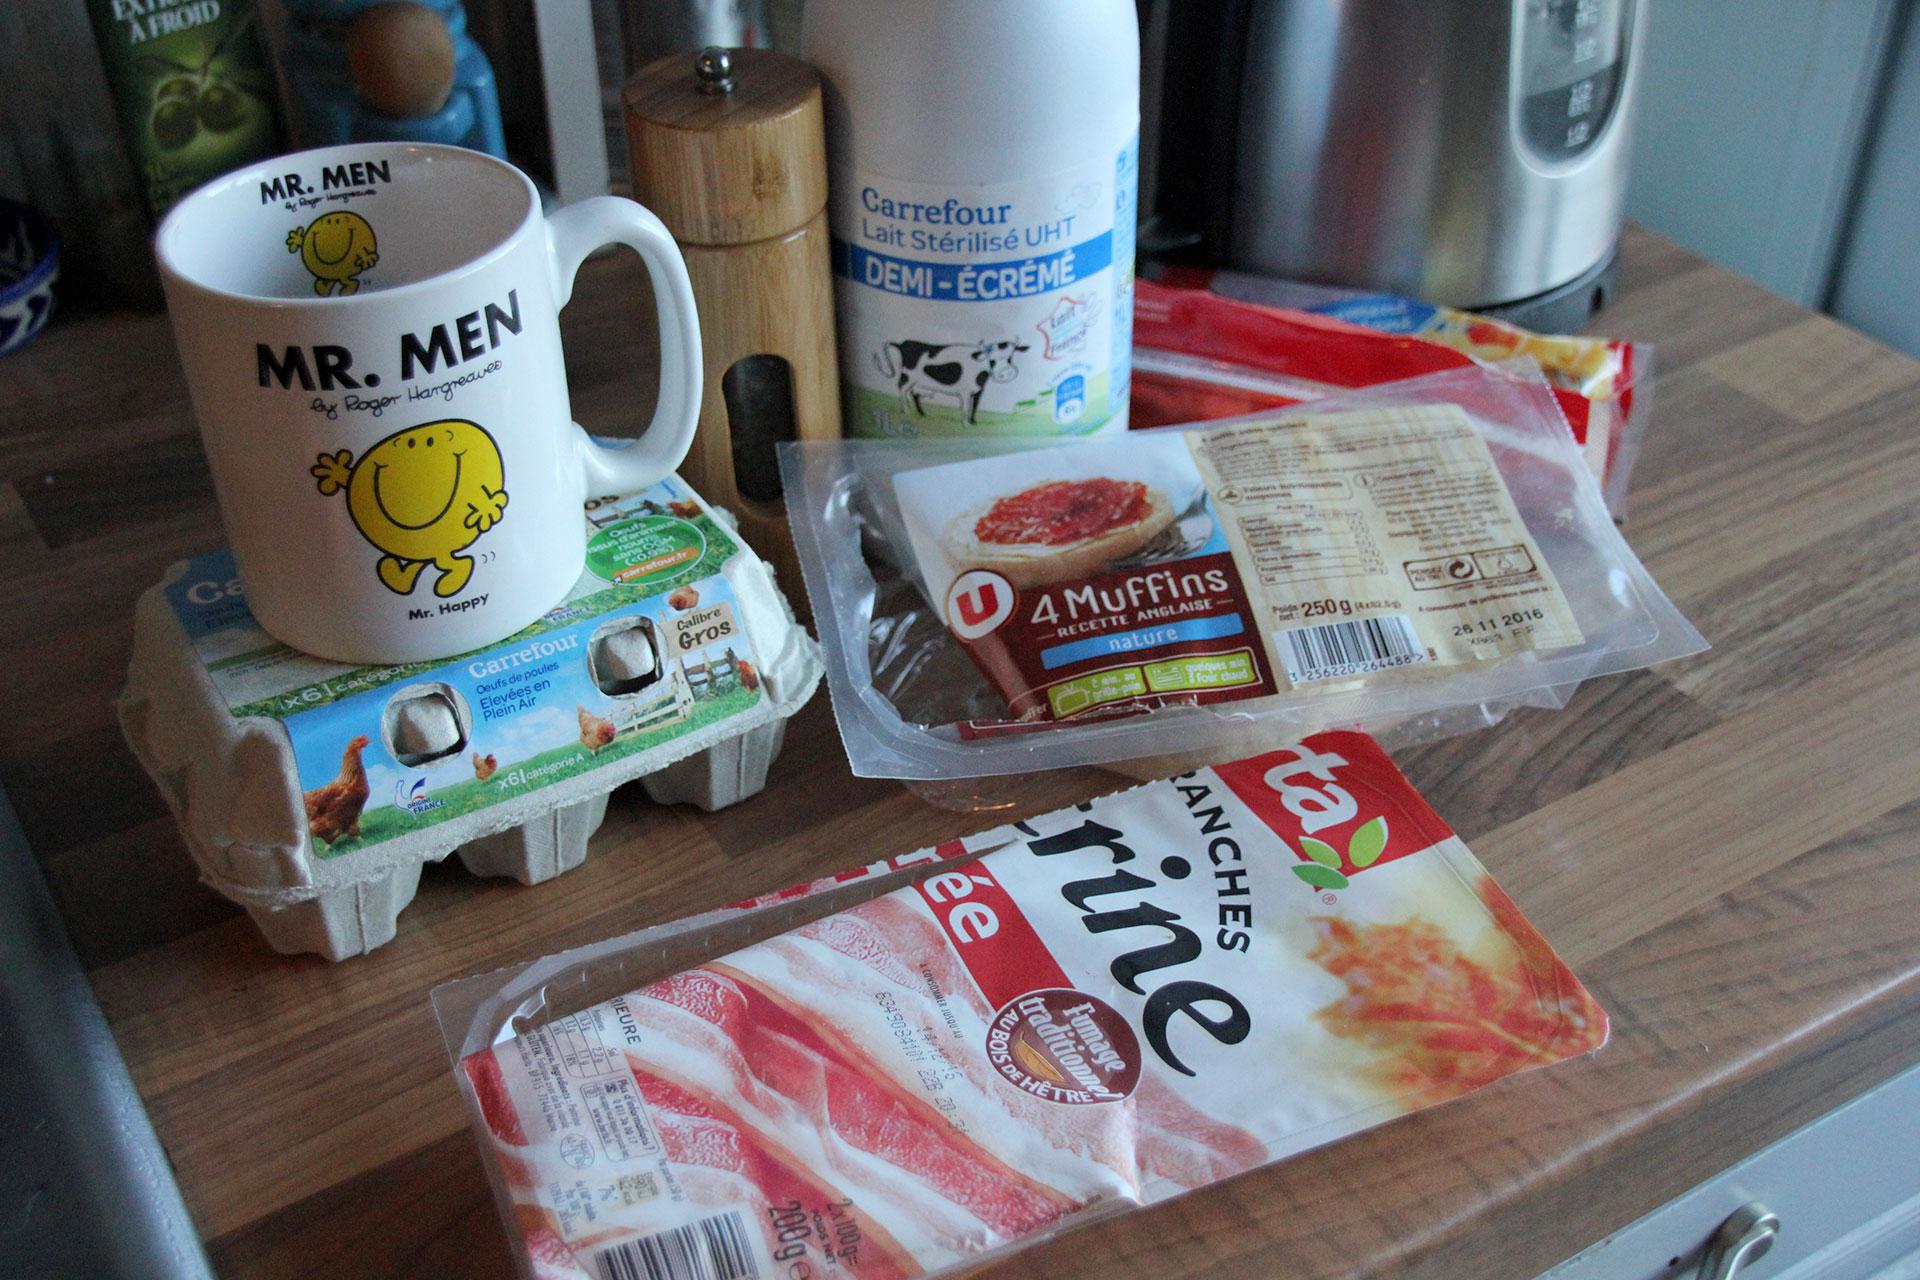 Scrambled egg ingredients